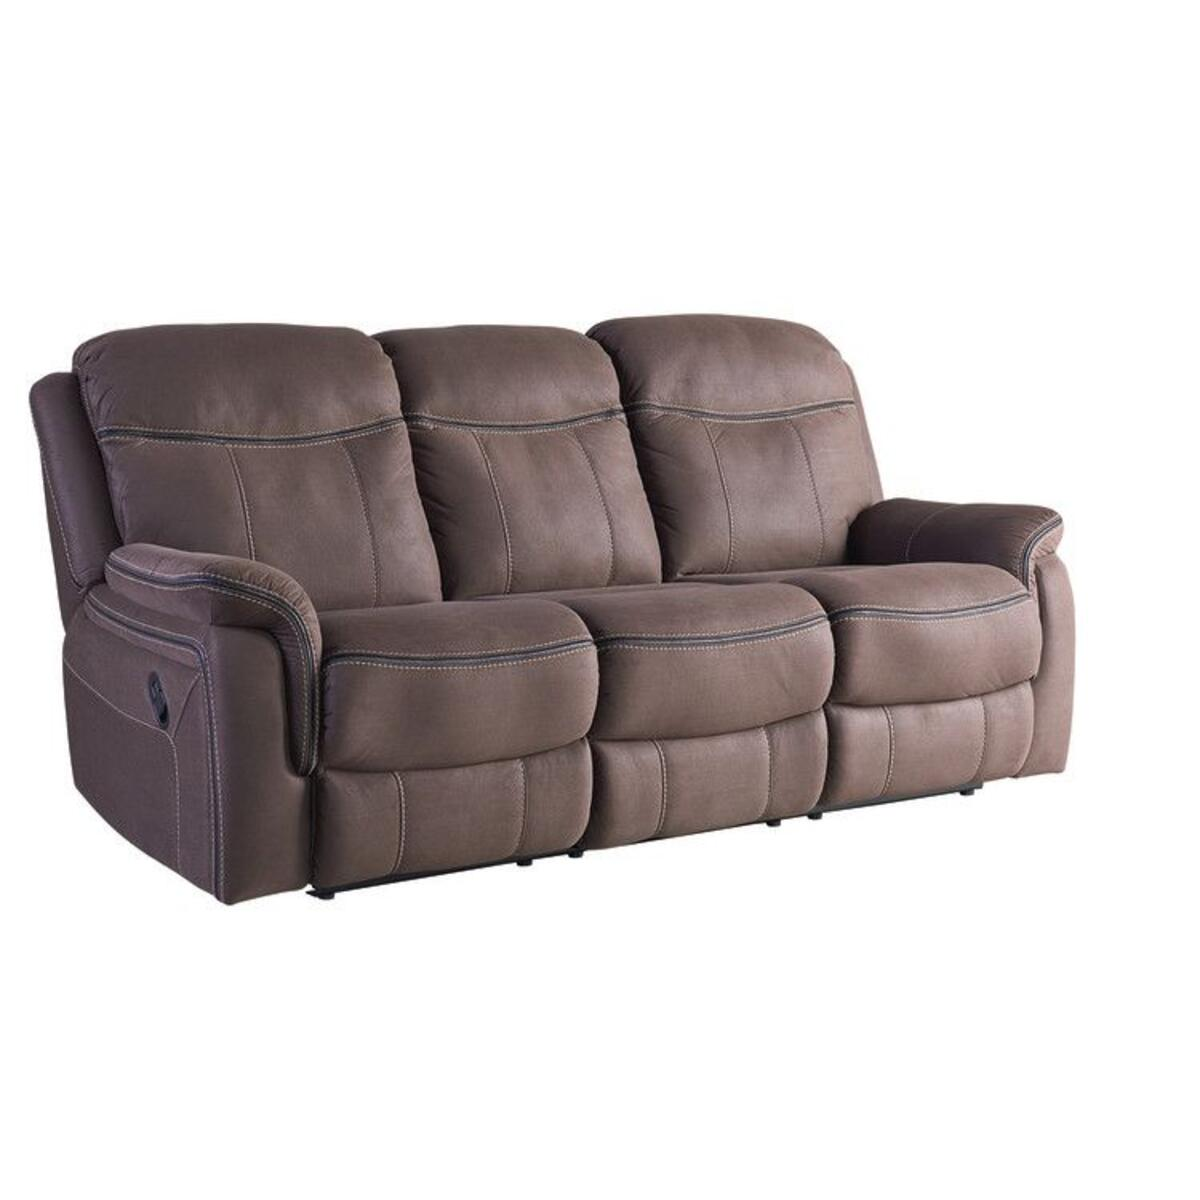 Champion Manual Motion Sofa, Taupe